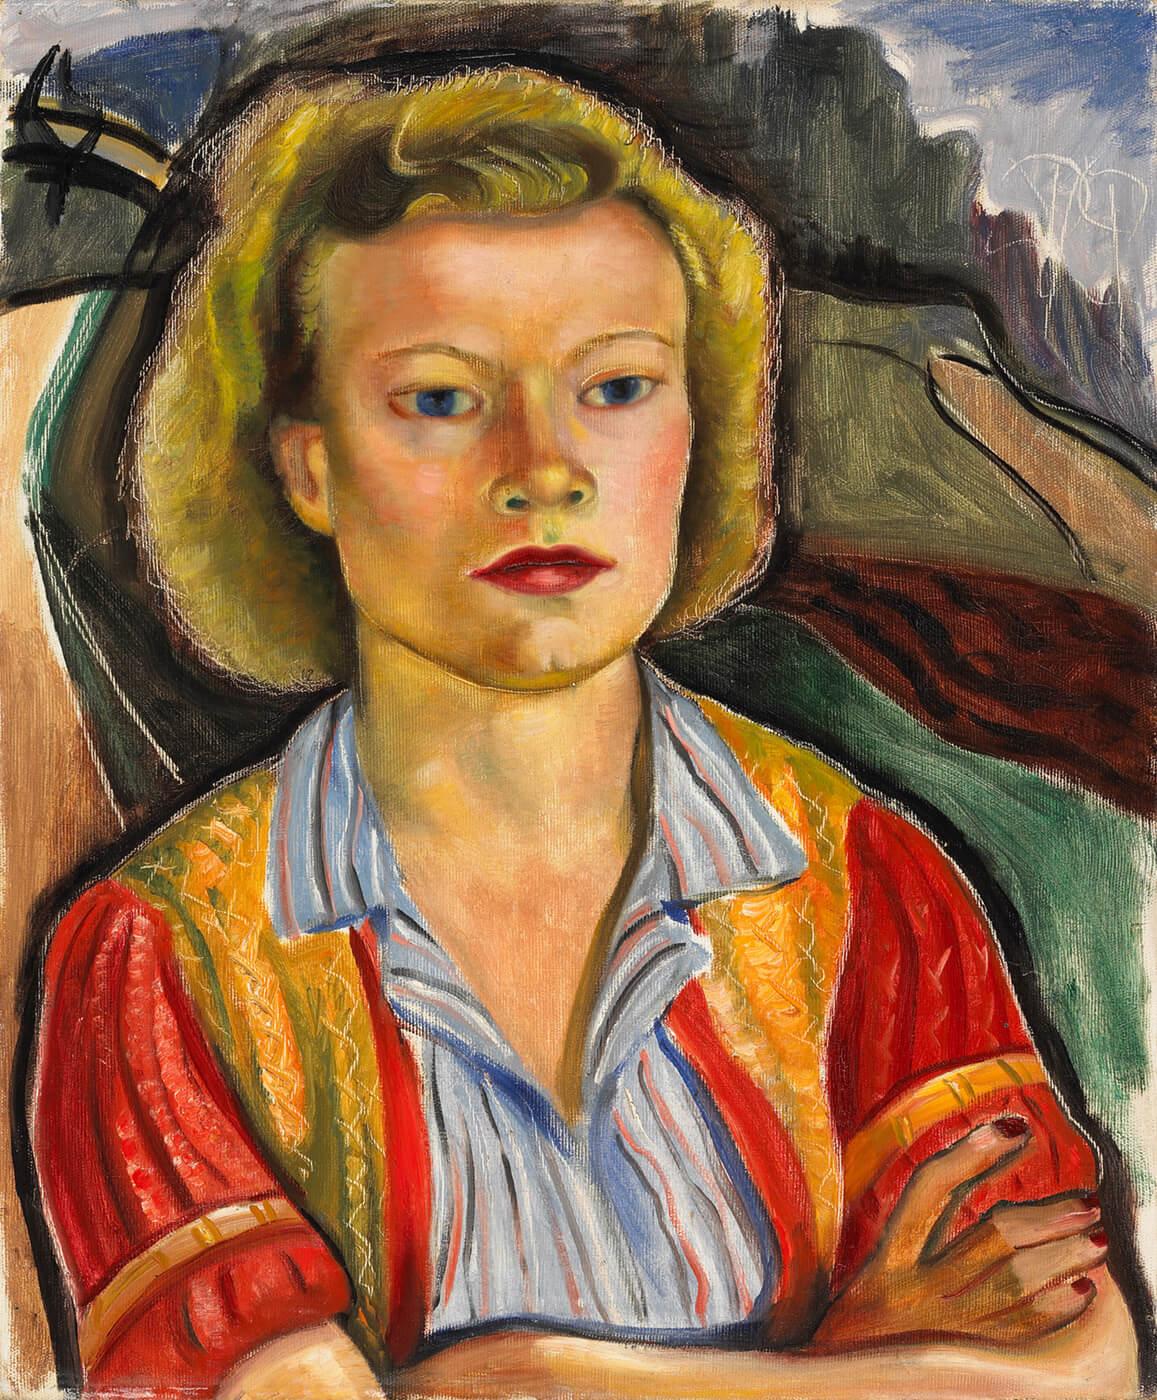 Prudence Heward, Farmer's Daughter, 1945